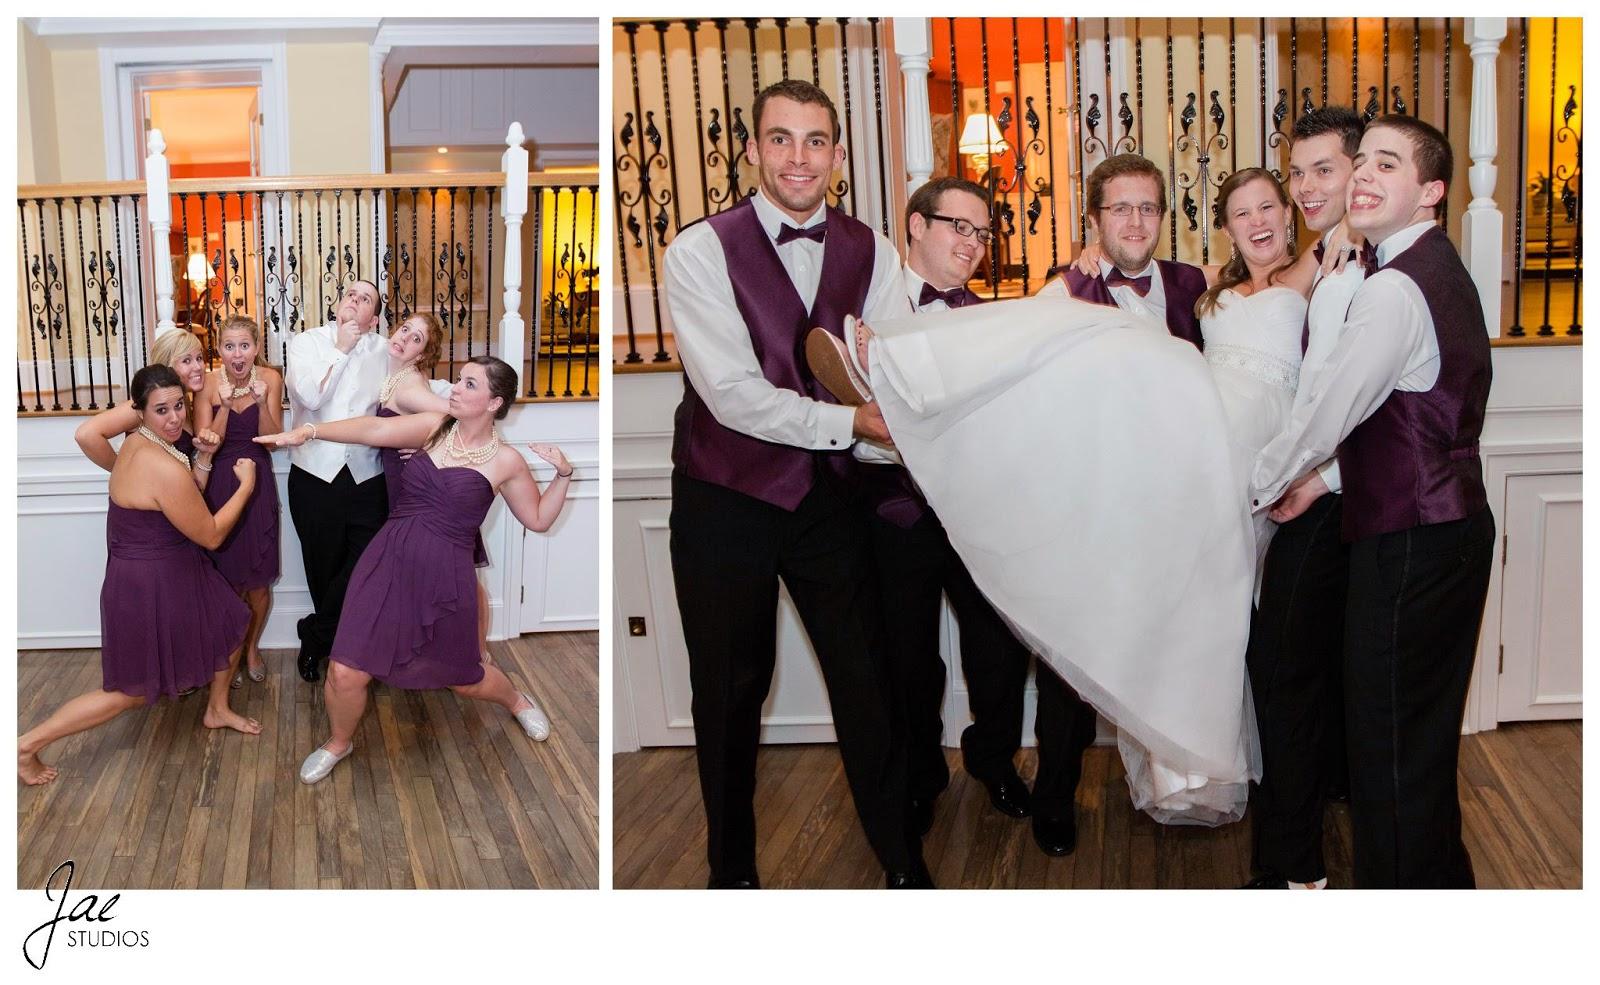 Jonathan and Julie, Bird cage, West Manor Estate, Wedding, Lynchburg, Virginia, Jae Studios, purple, bridesmaids, dresses, wedding dress, groomsmen, holding, groom, posing, funny